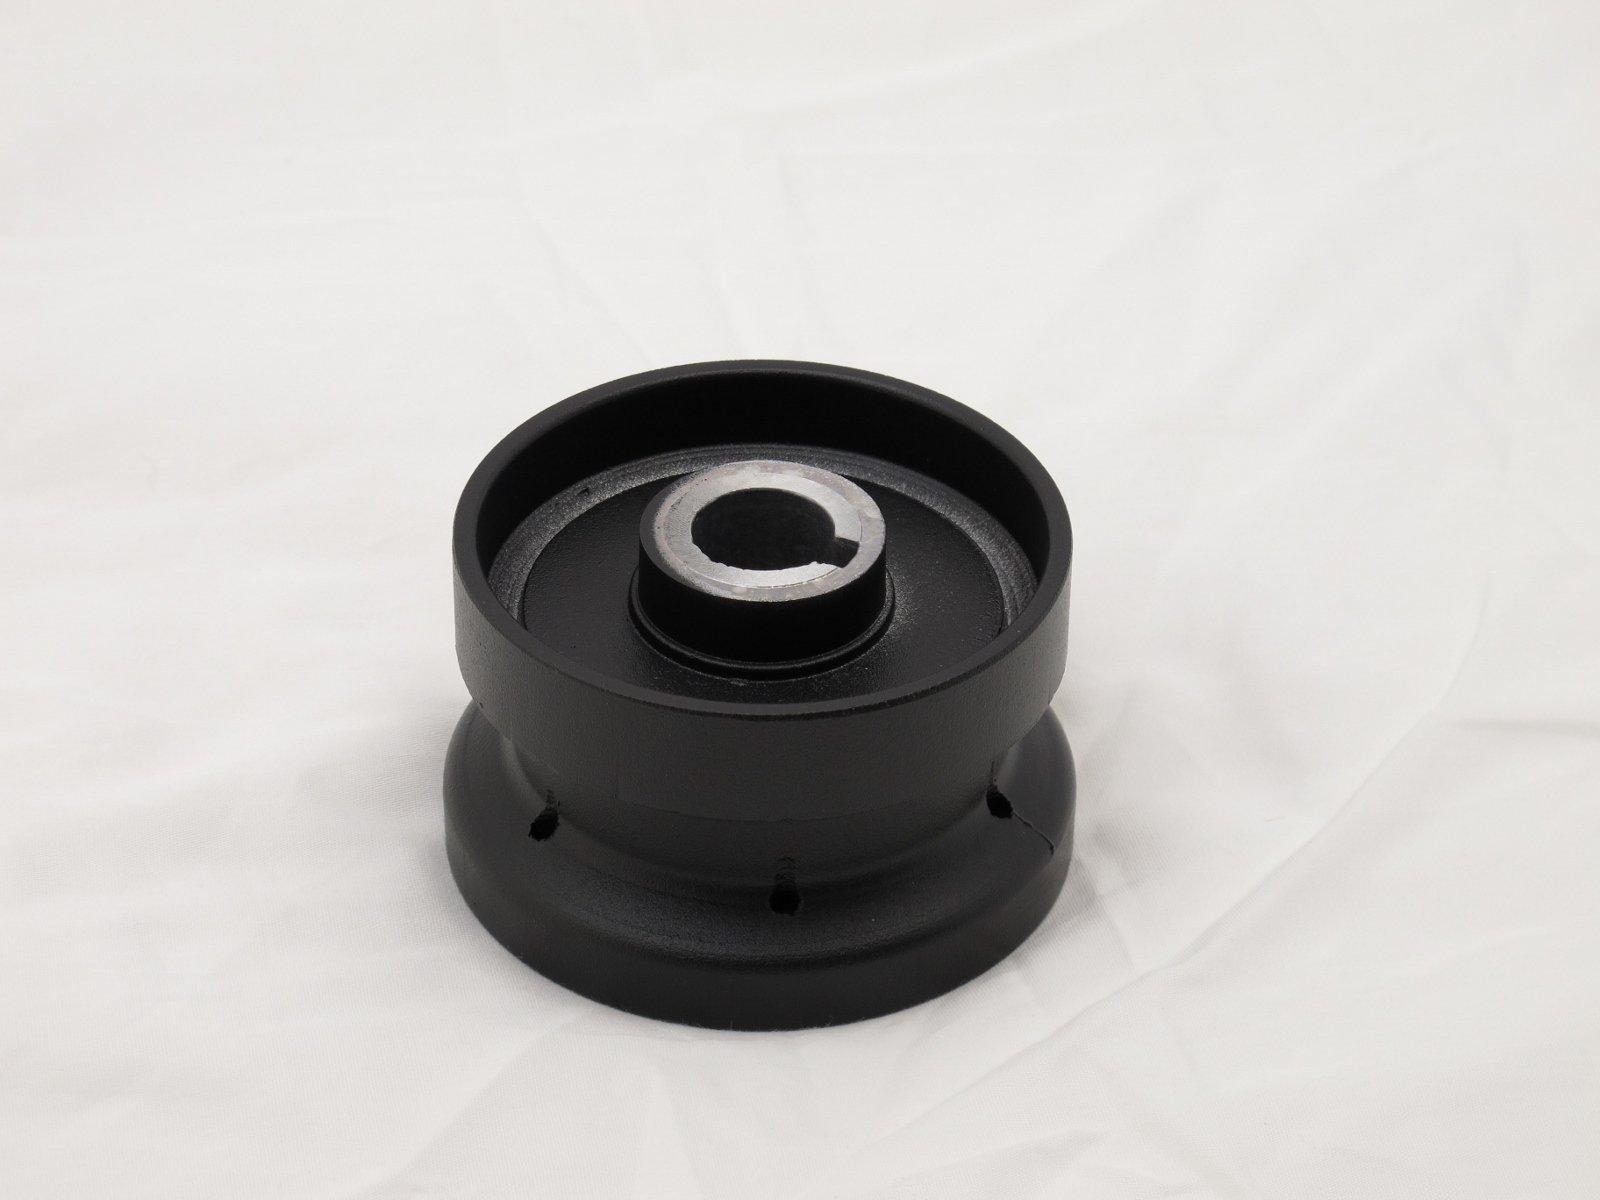 Marine Boat Steering Wheel Hub Adapter Keyed 3//4 inch Teleflex TFLEX 9 Bolts